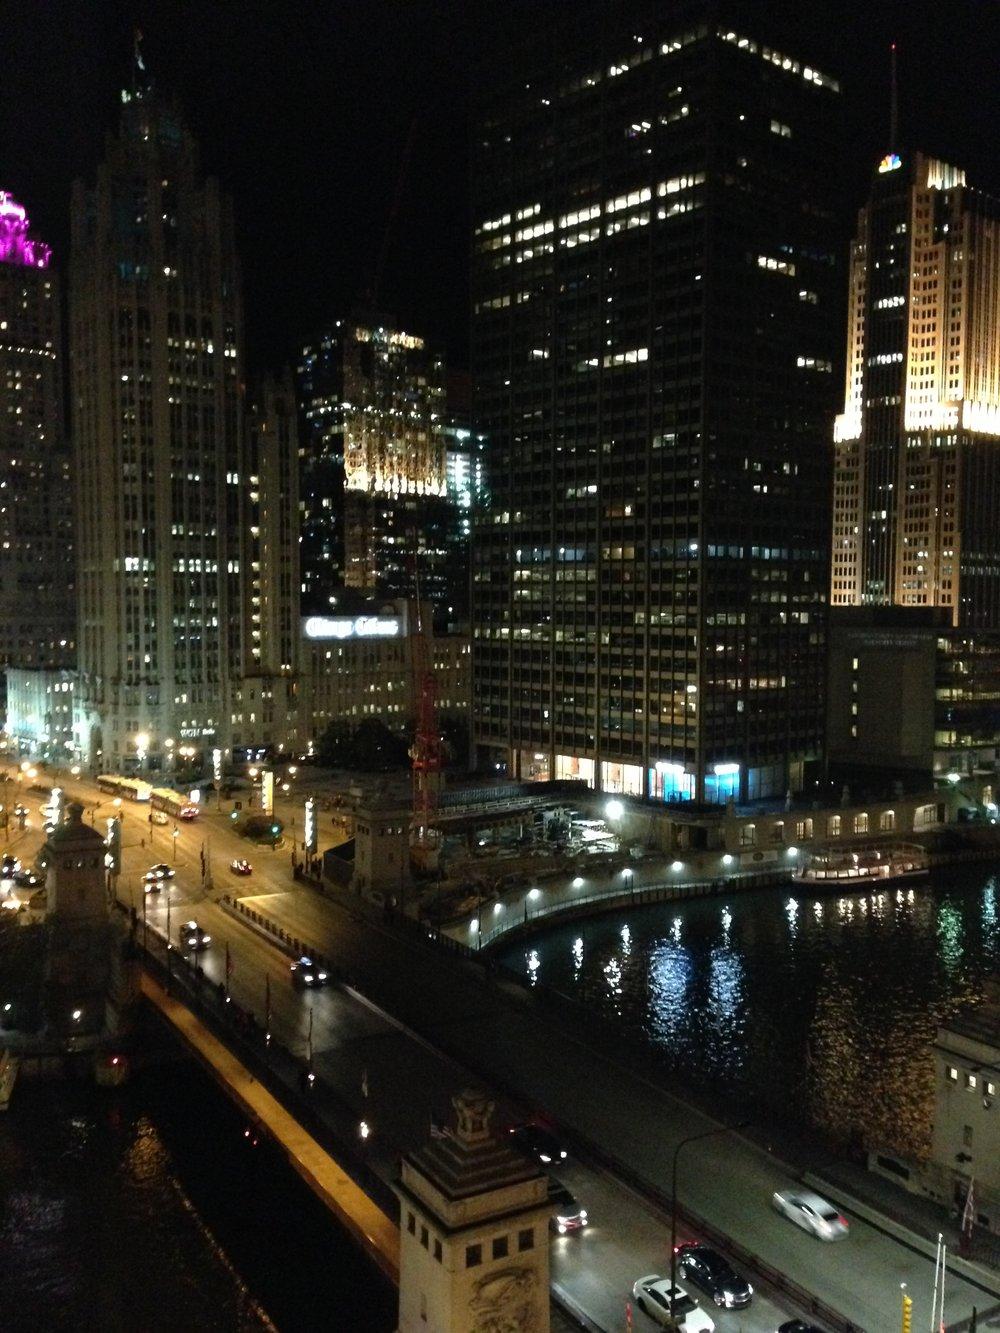 Chicago at night...